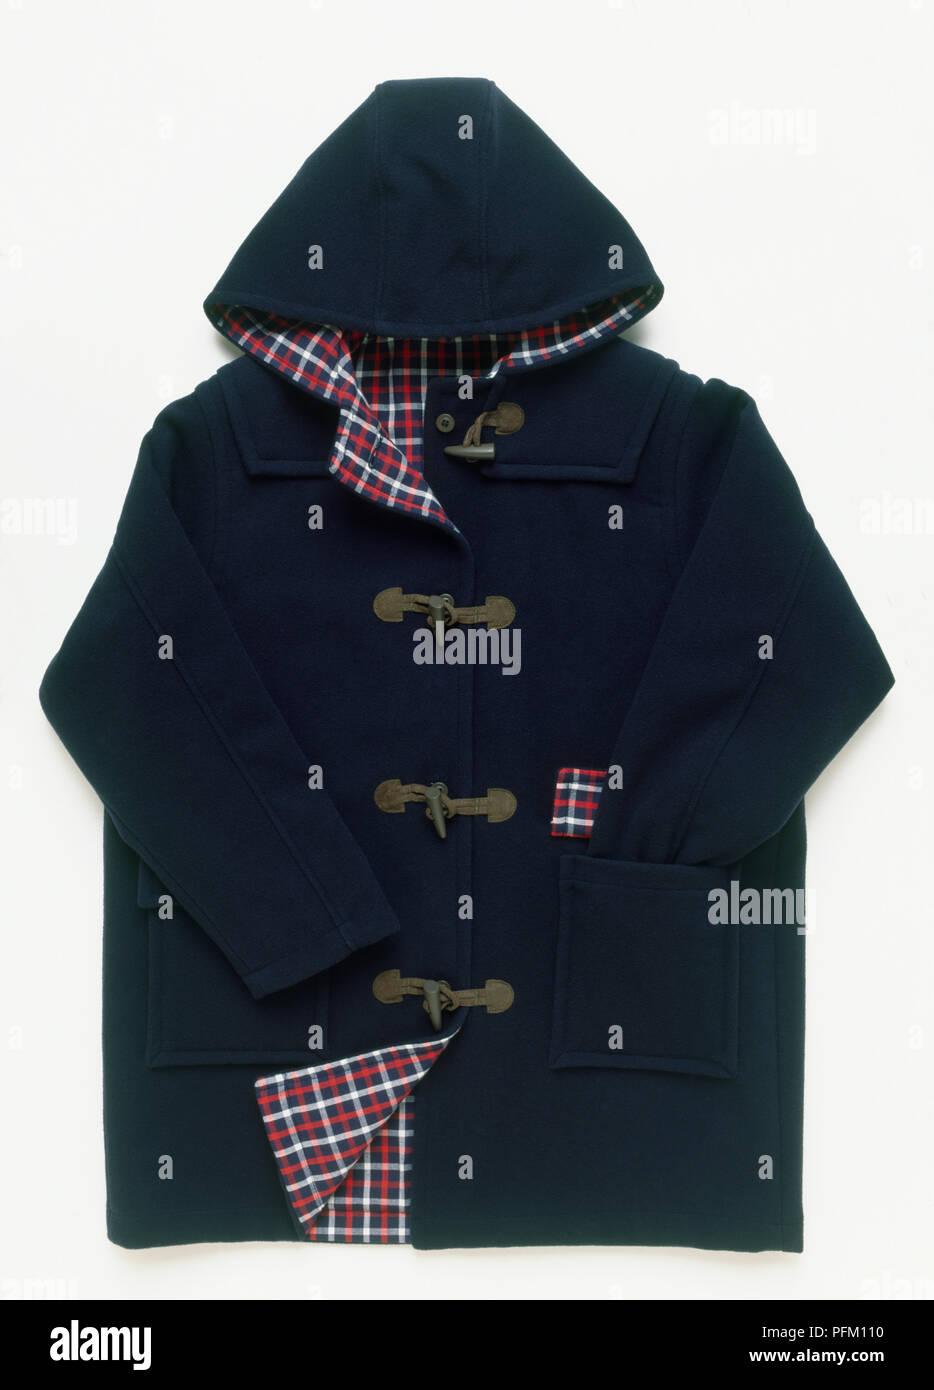 Azul oscuro duffle coat con capucha y forro de tartán Imagen De Stock